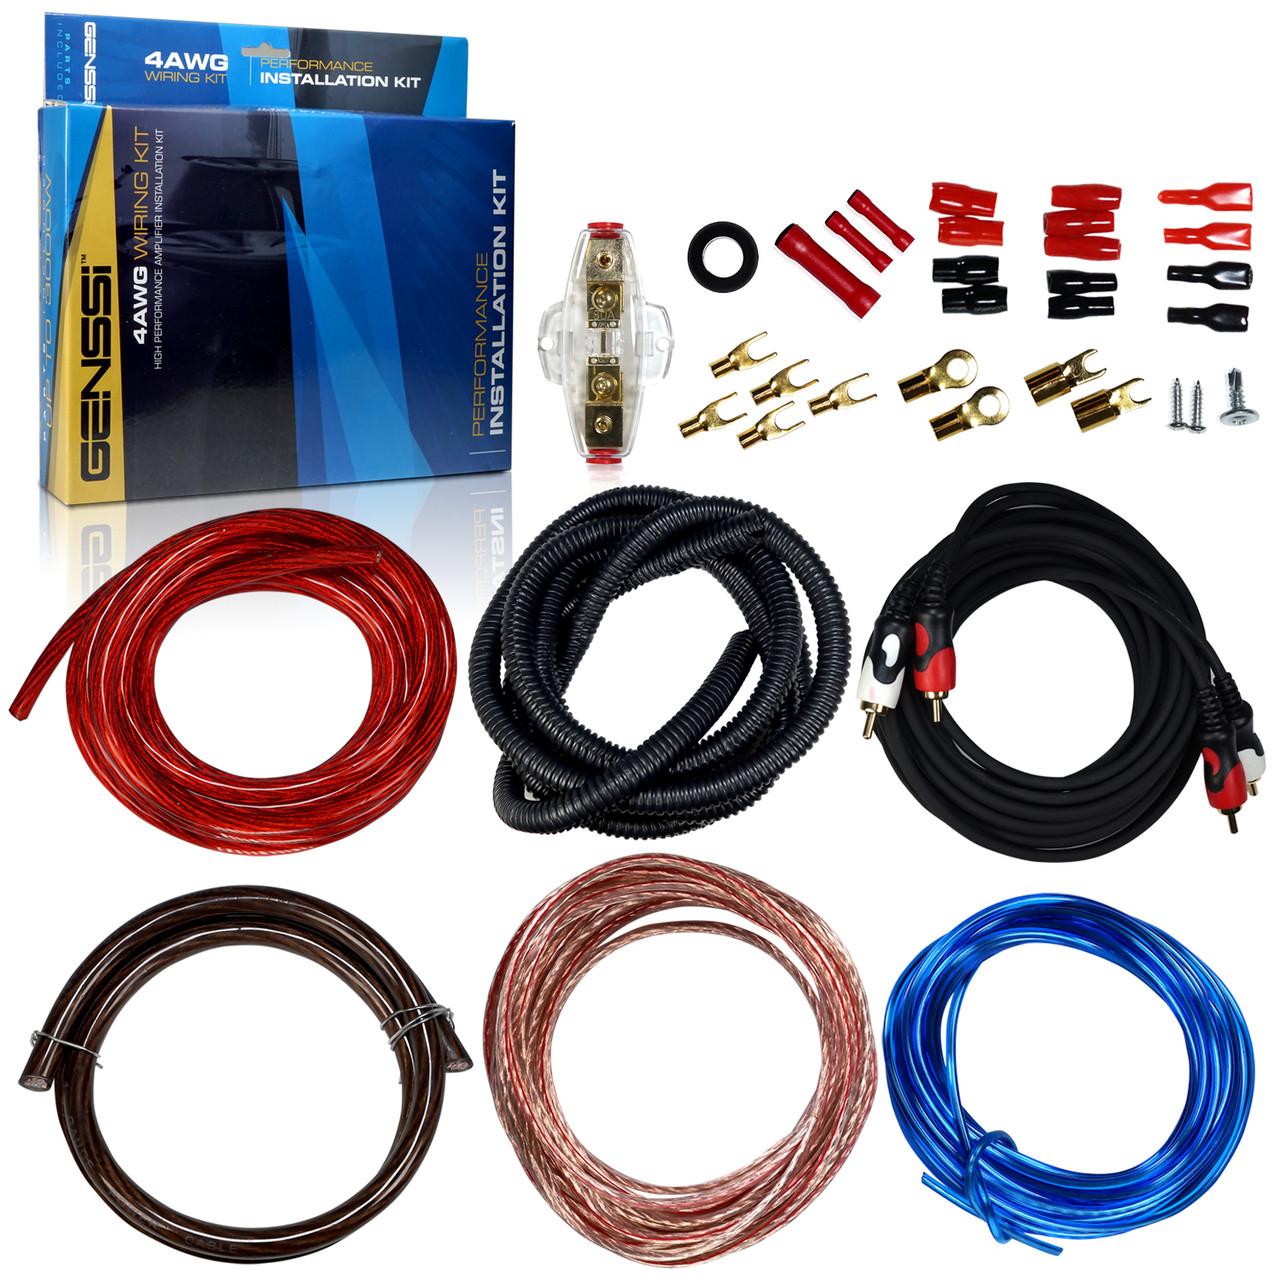 hight resolution of 4awg car audio installation wiring kit 4 gauge genssi 4 gauge wiring kit car audio